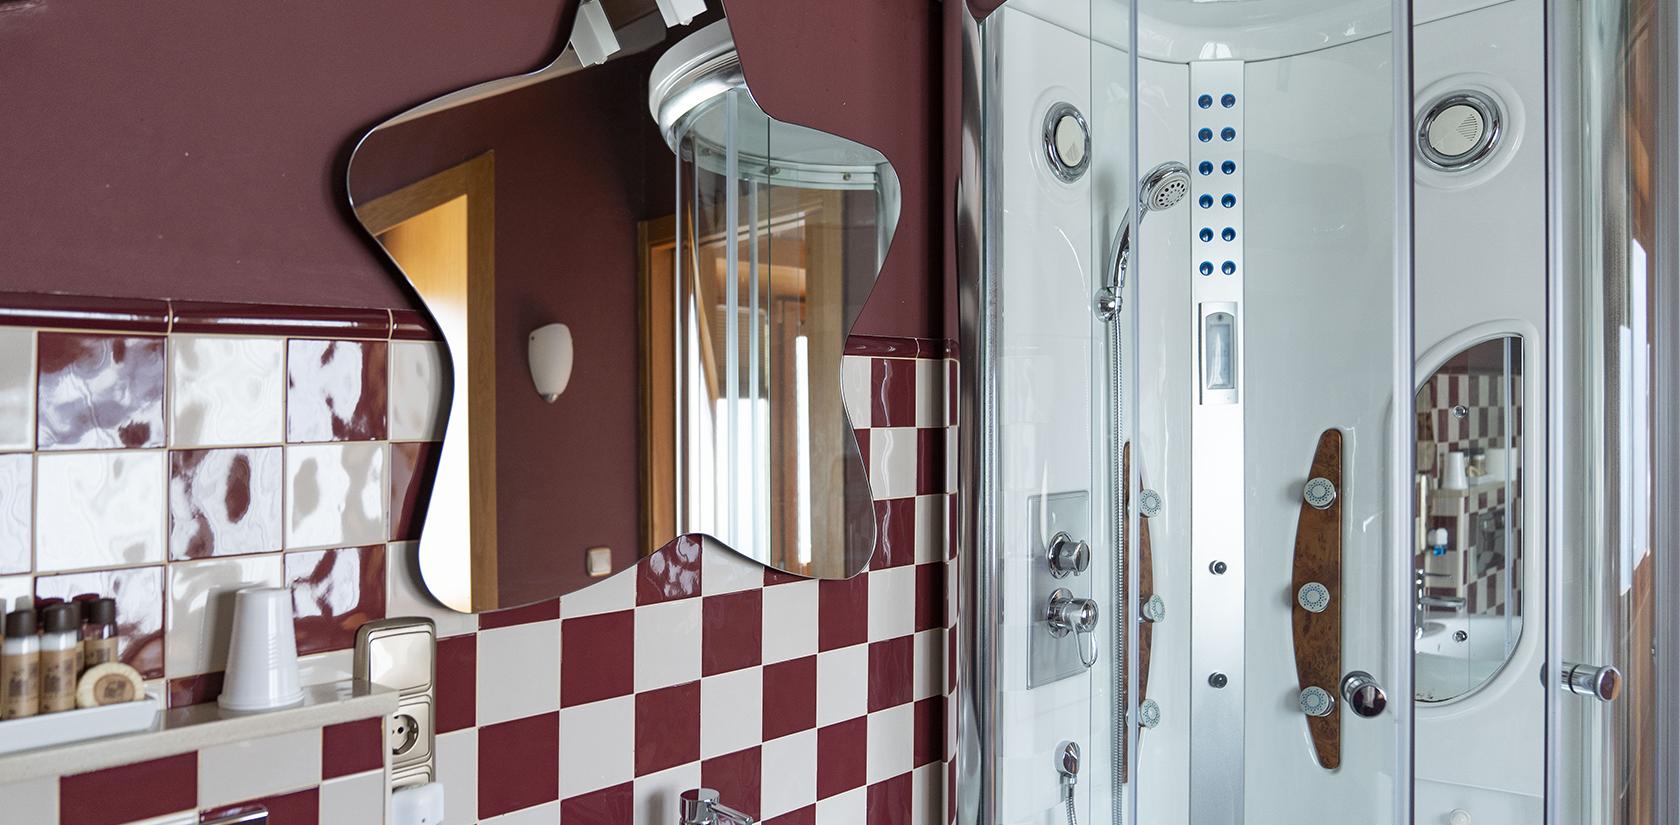 Habitación Arousa, detalle del baño